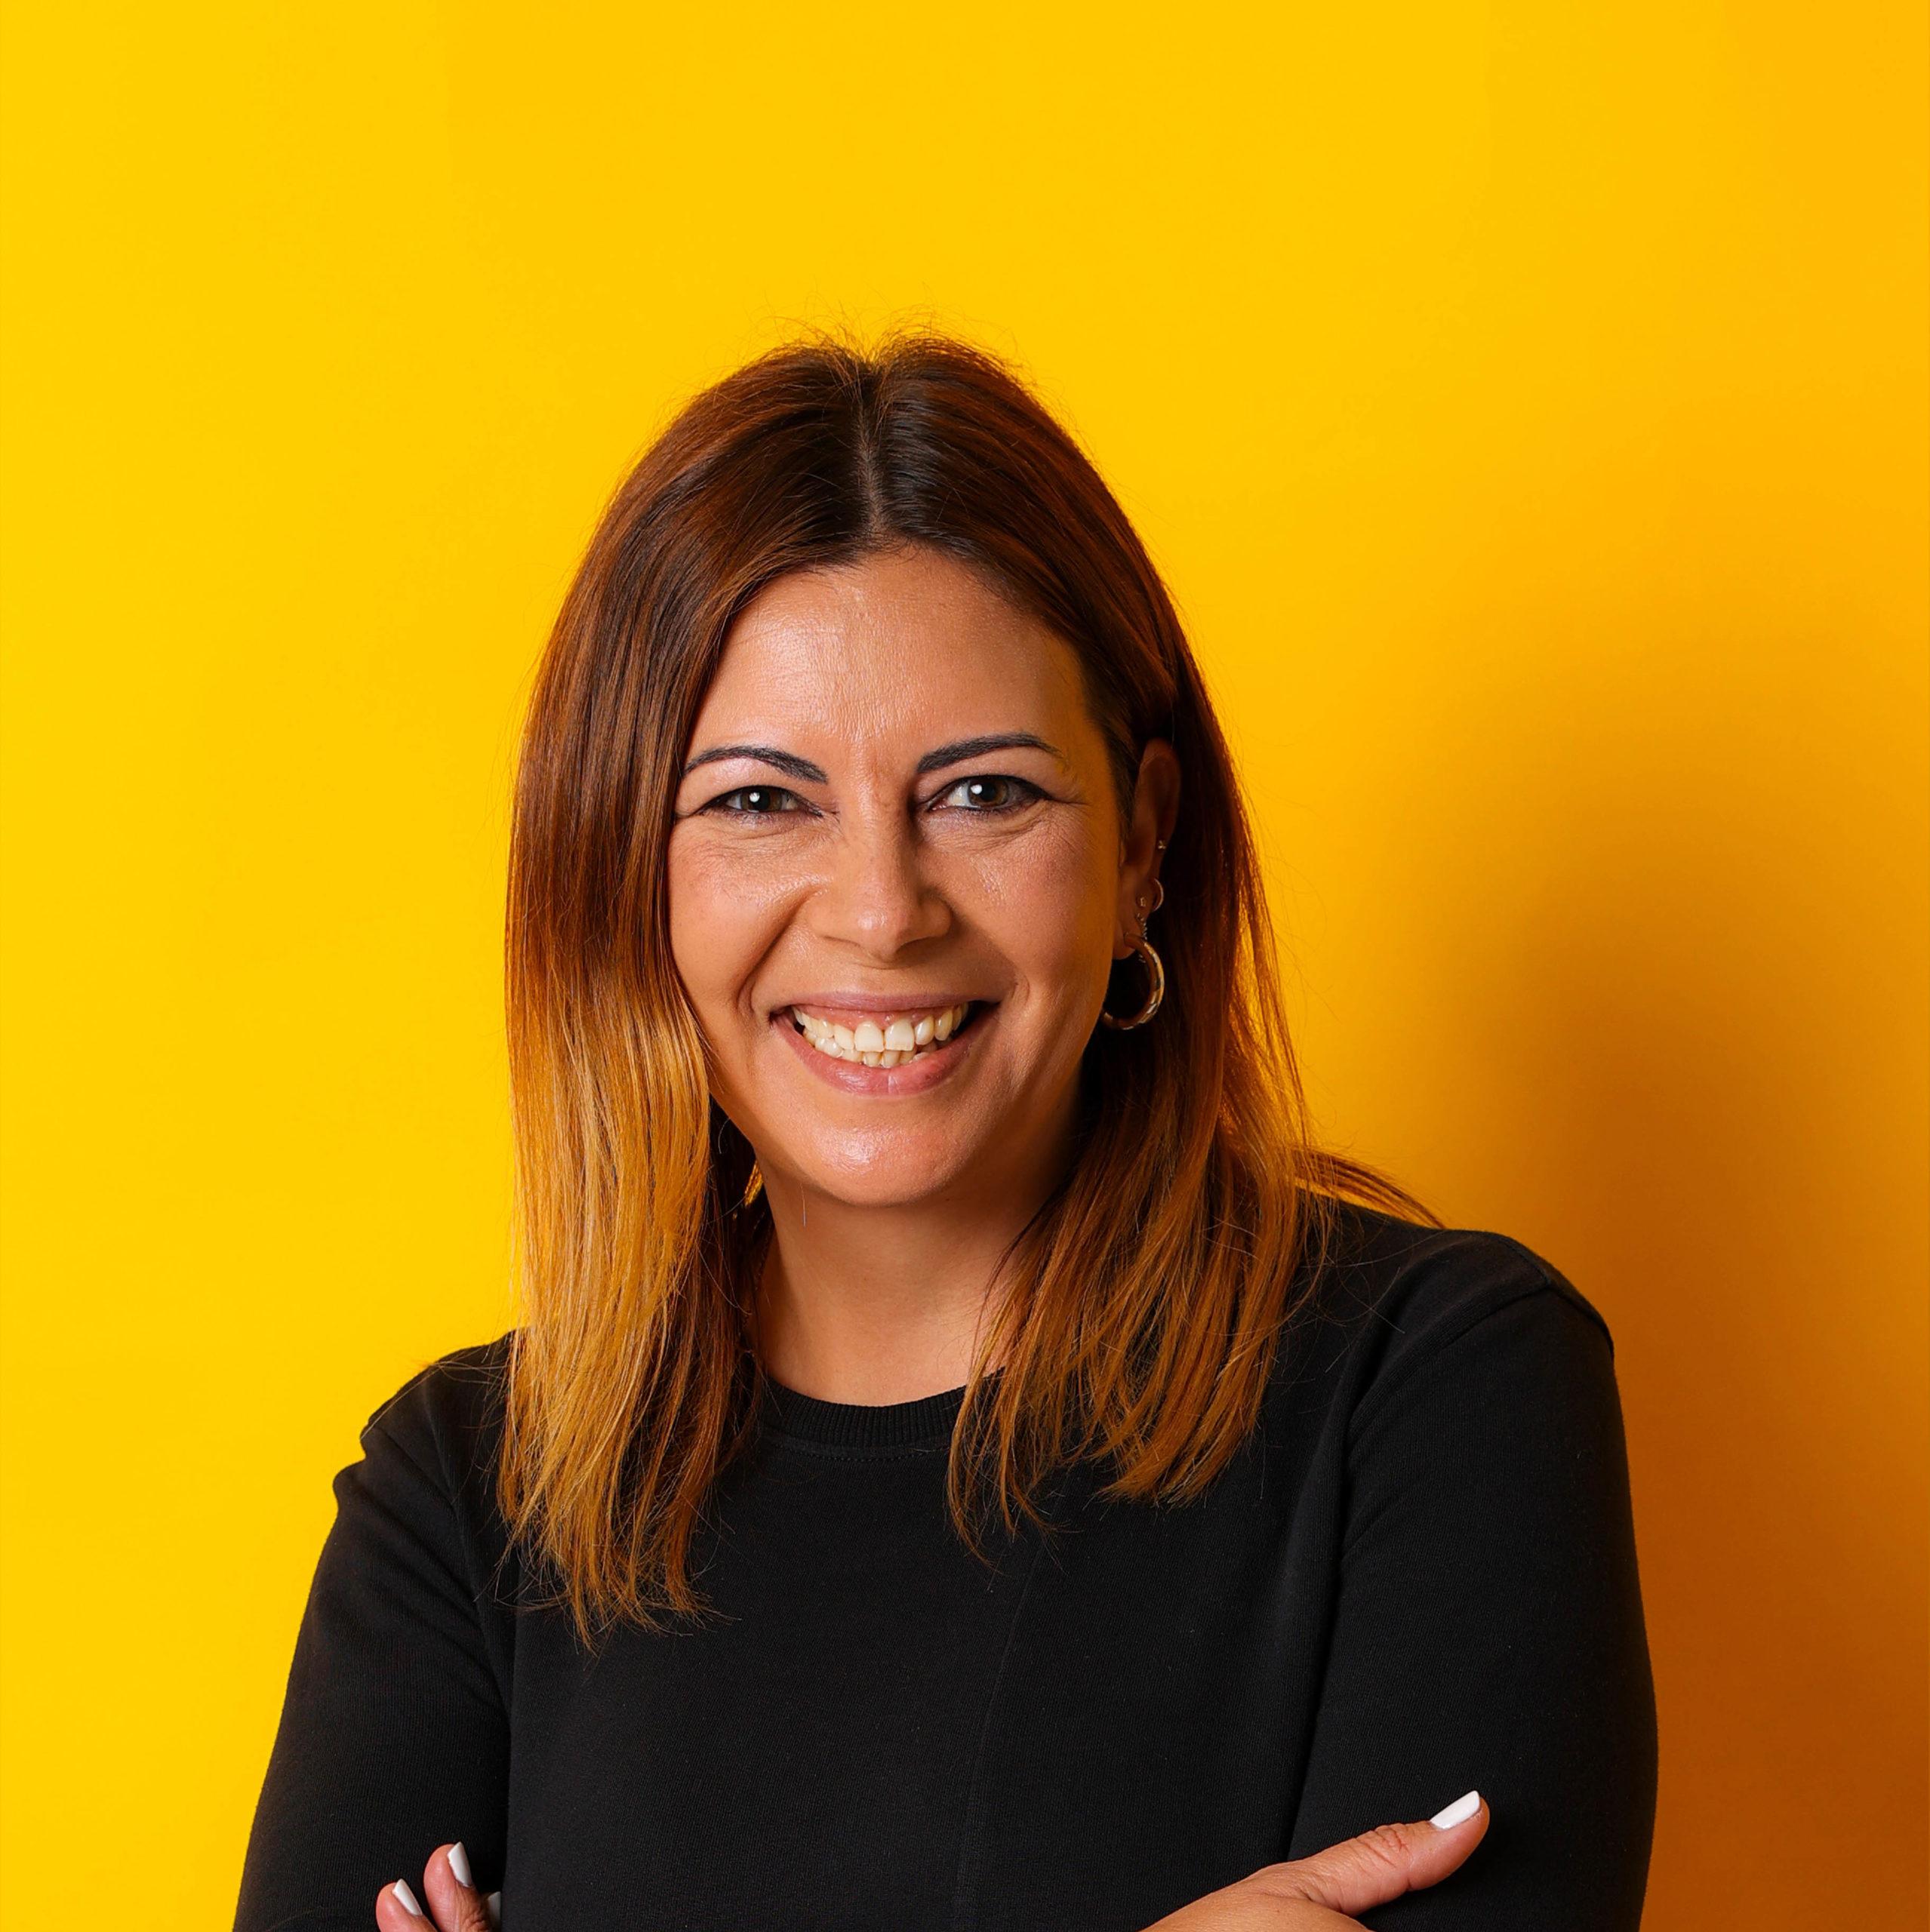 Olga Saez Moreno